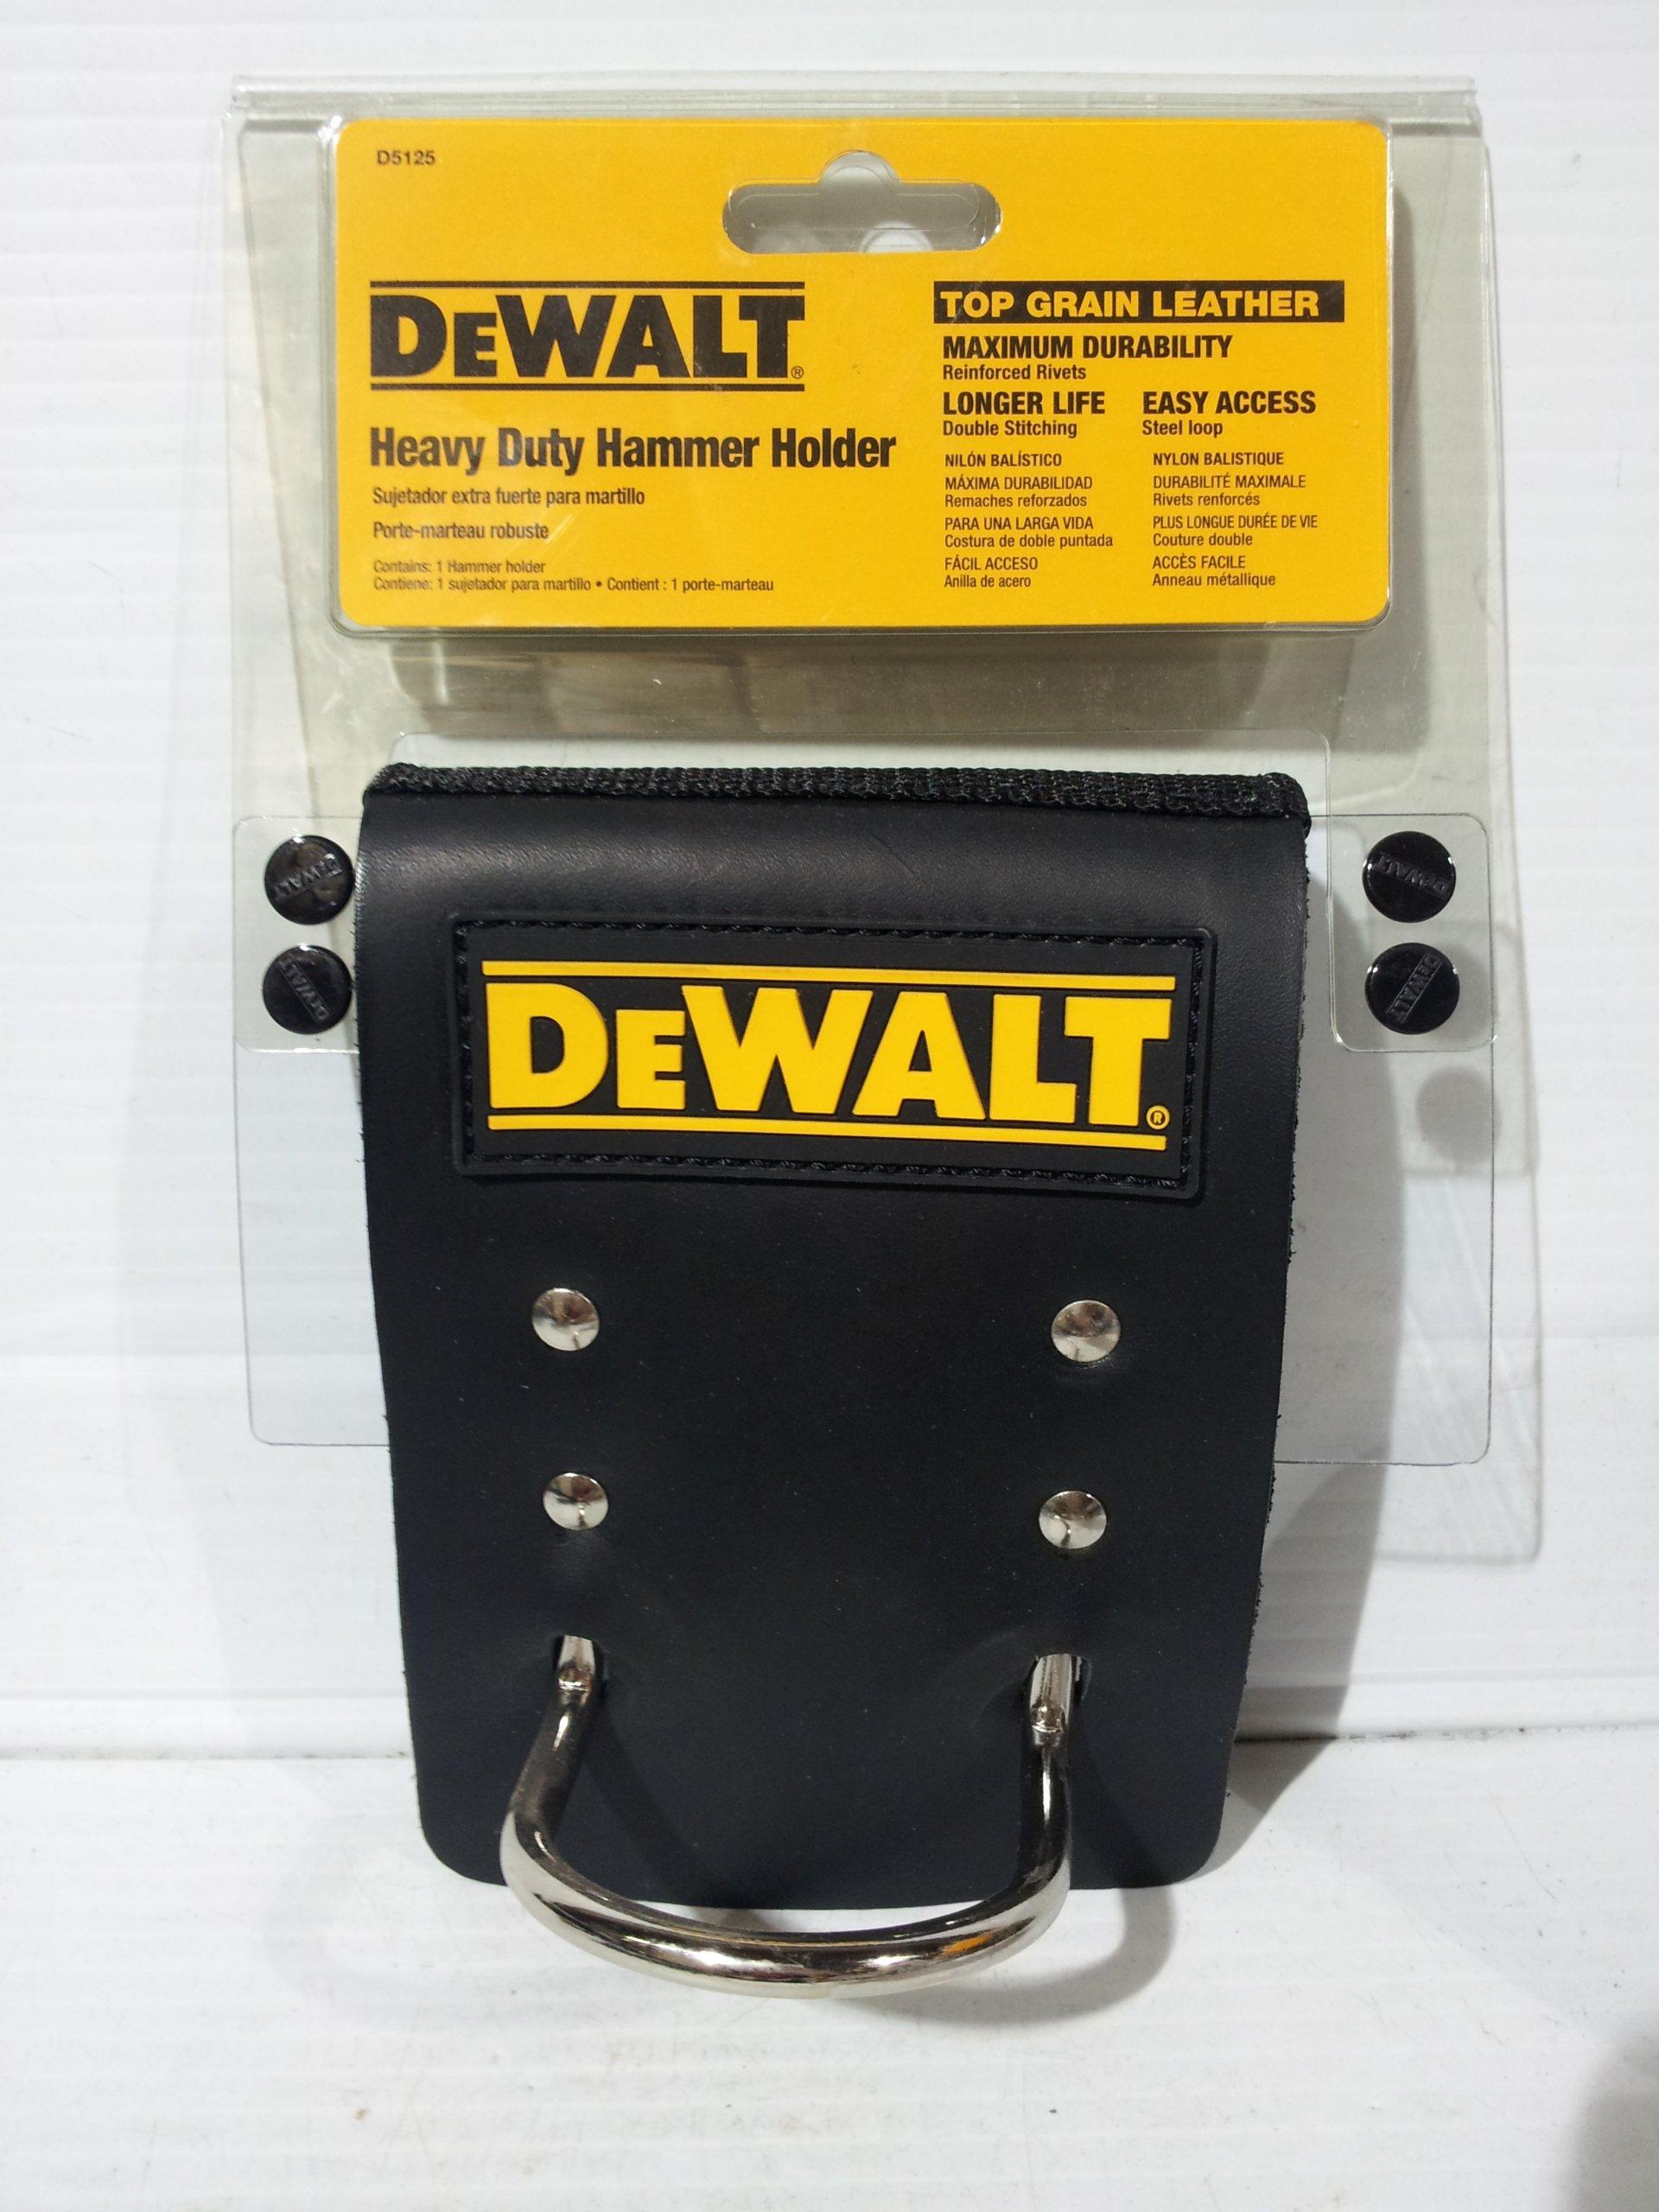 DEWALT D5125 Heavy Duty Top Grain Leather Hammer Holder